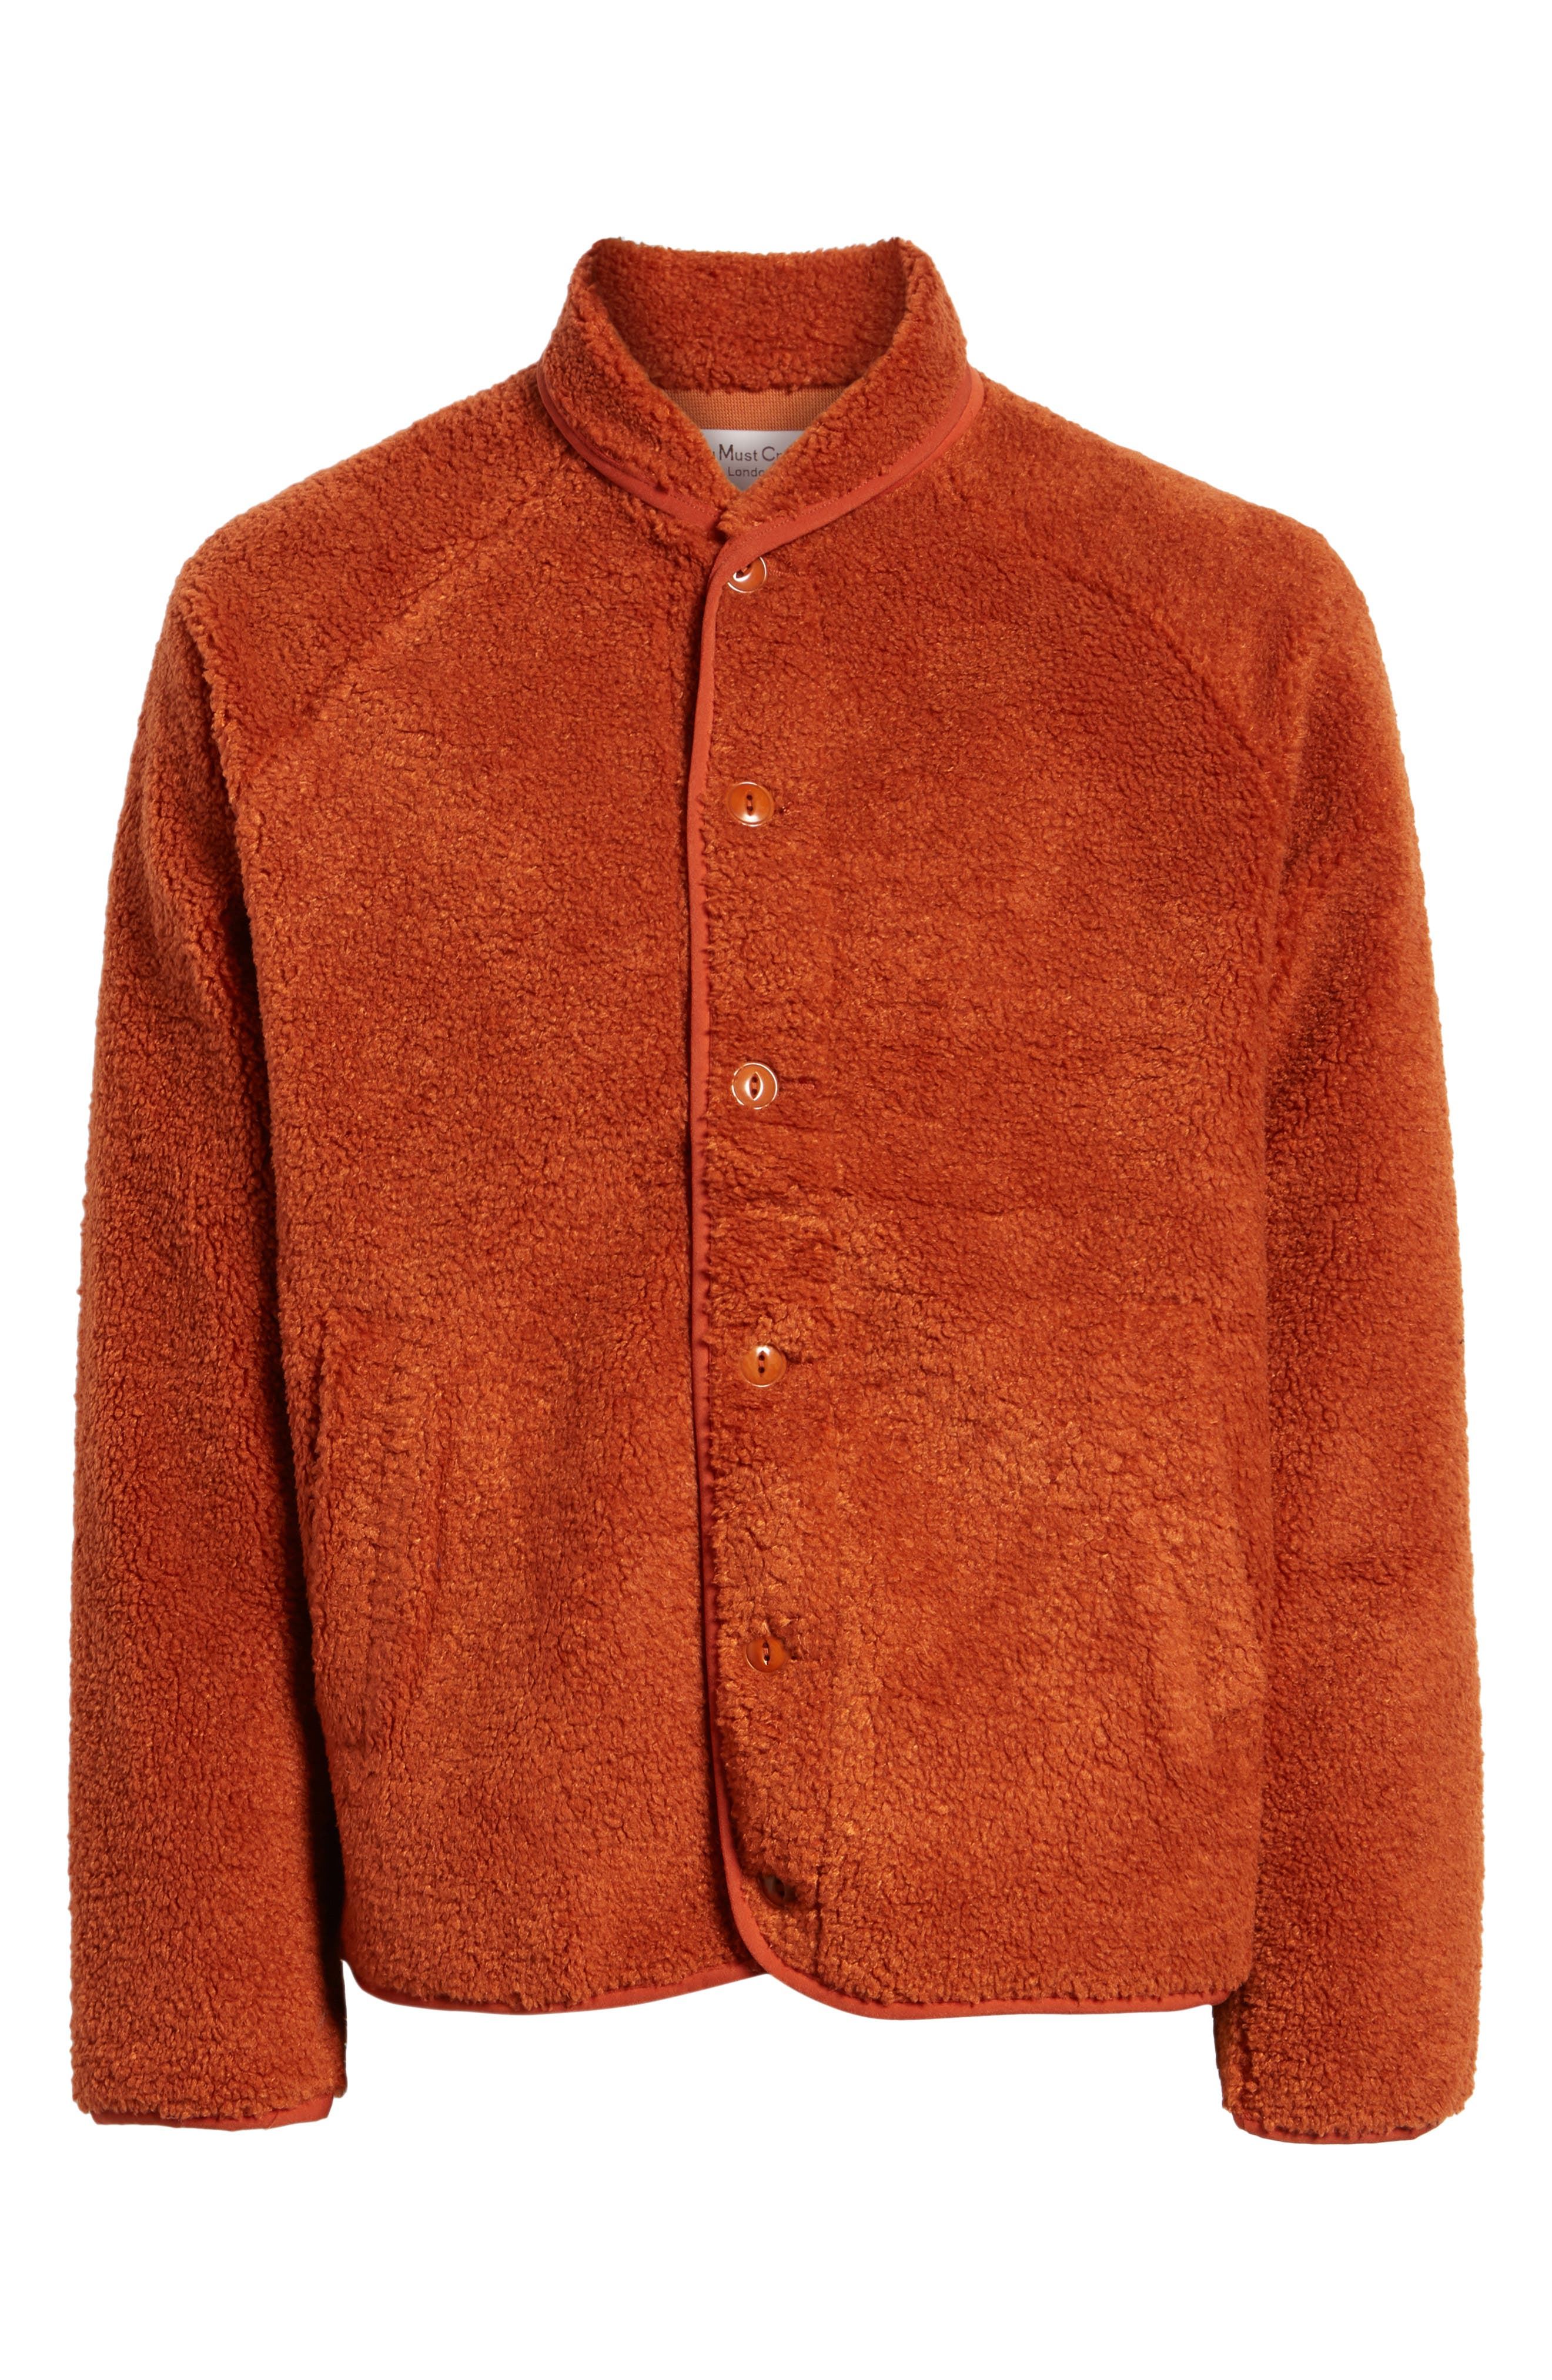 Beach Fleece Jacket,                             Alternate thumbnail 5, color,                             600